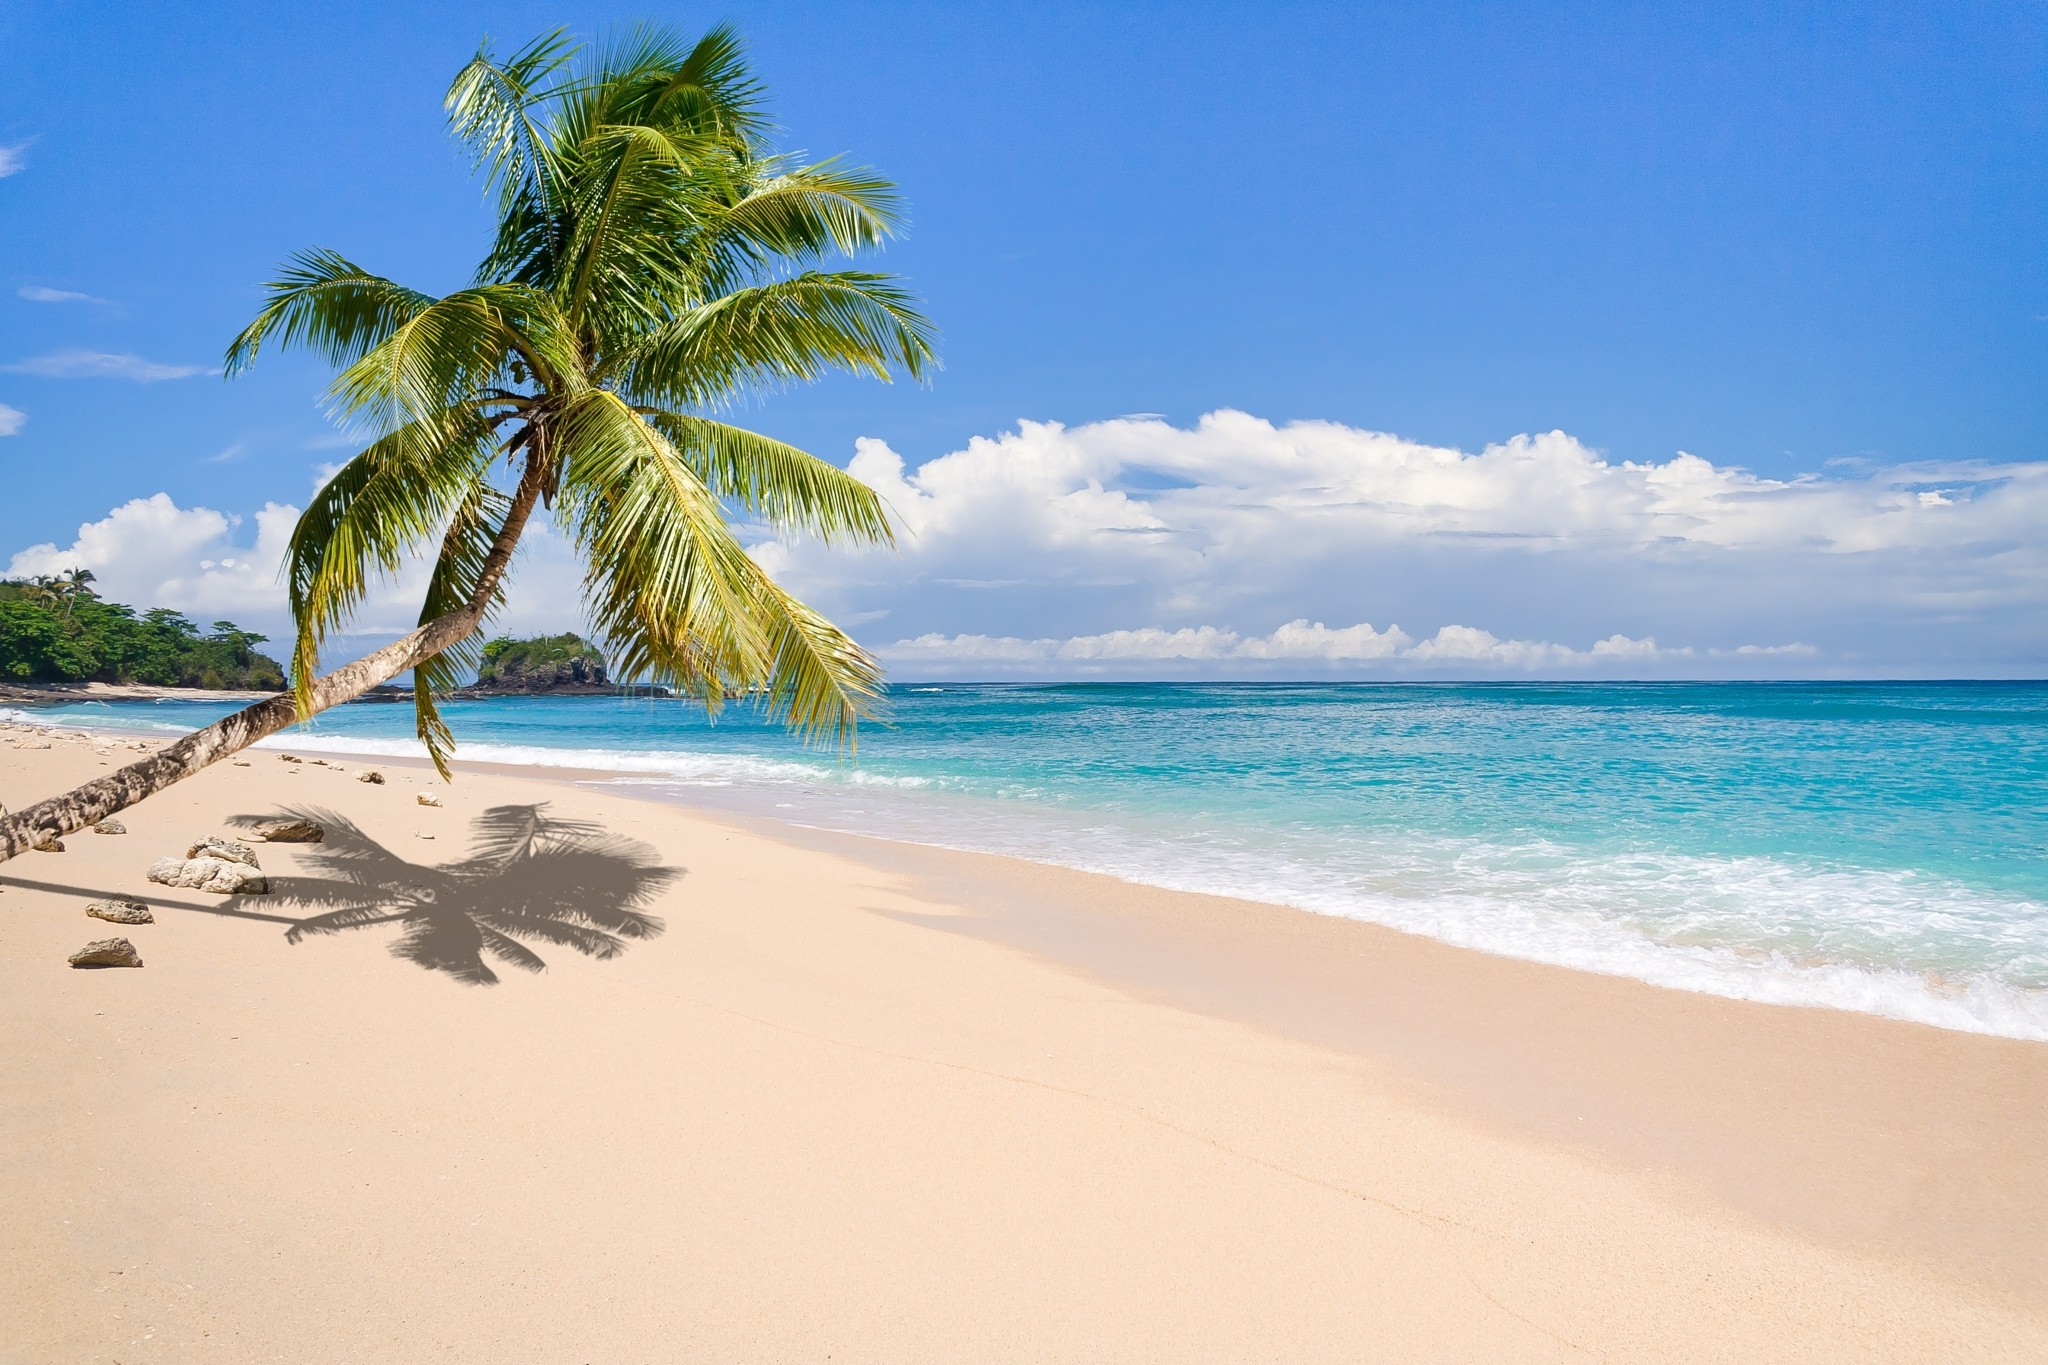 Tropical Island Desktop Backgrounds 47 Wallpapers 2048x1365